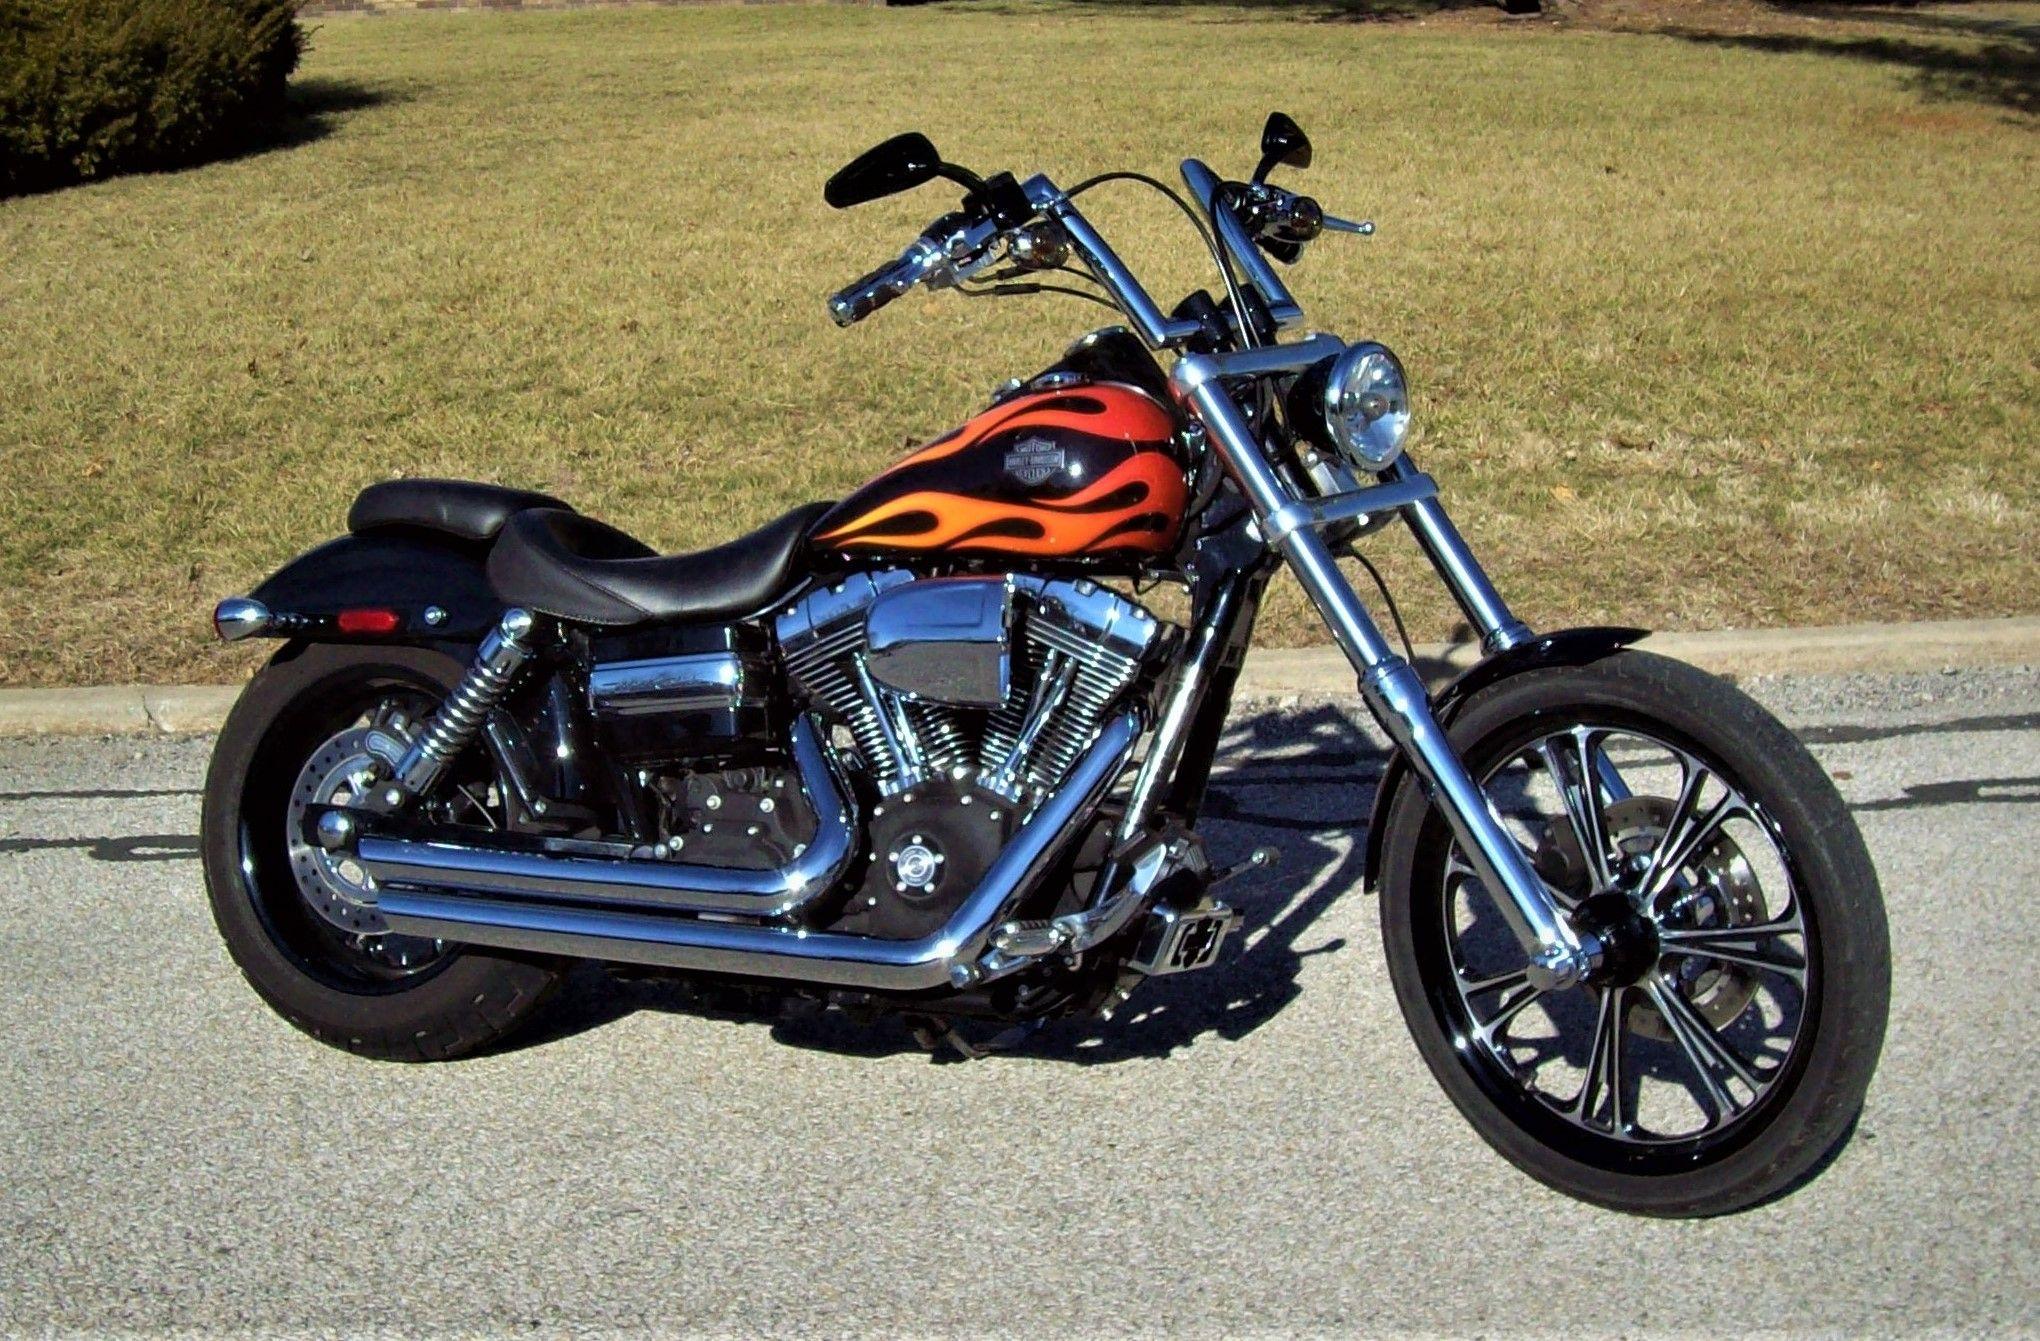 Rc Components Wheels Harley Dyna Wide Glide Harley Harley Davidson